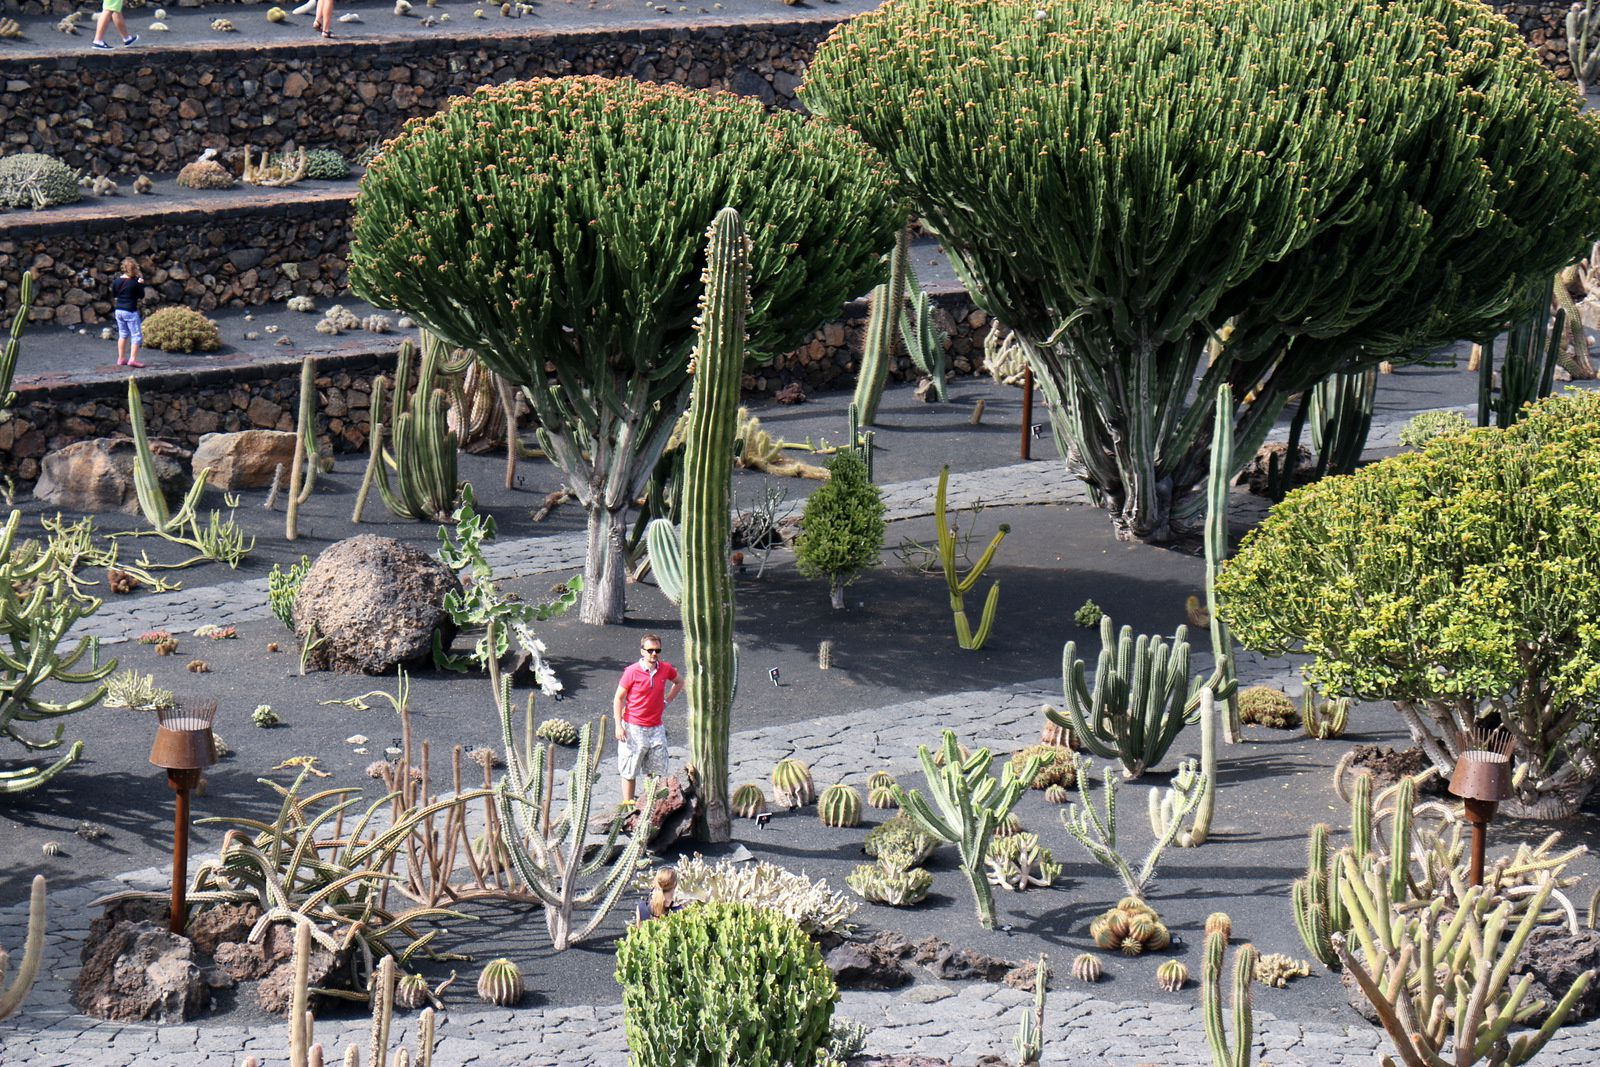 Browningla Hertlingiana, jardin de cactus (Lanzarote, Canaries)